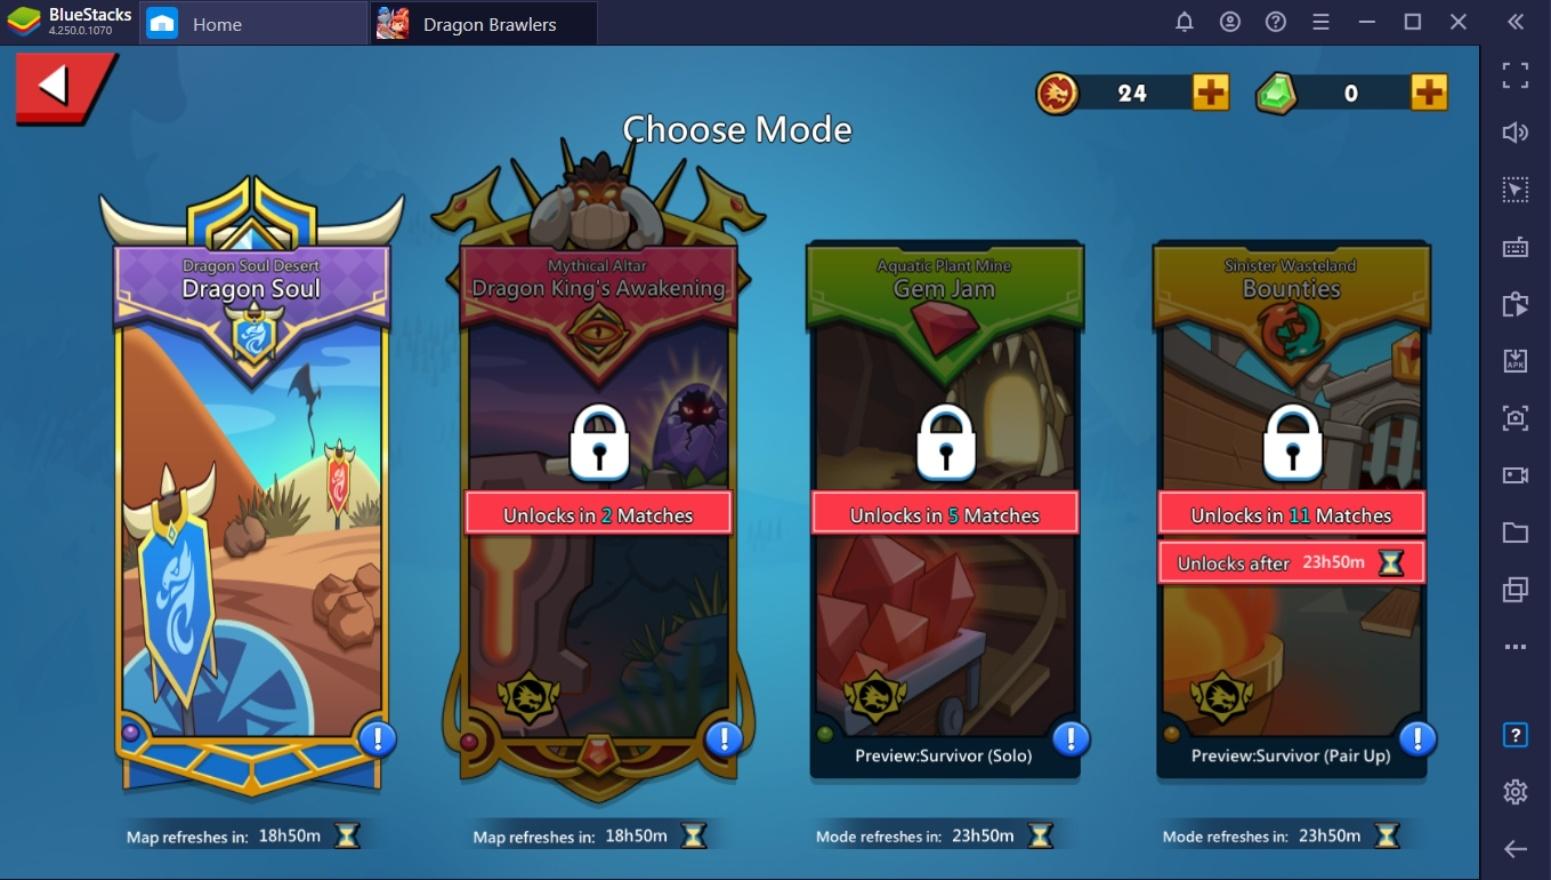 Explaining Dragon Brawler Game Modes